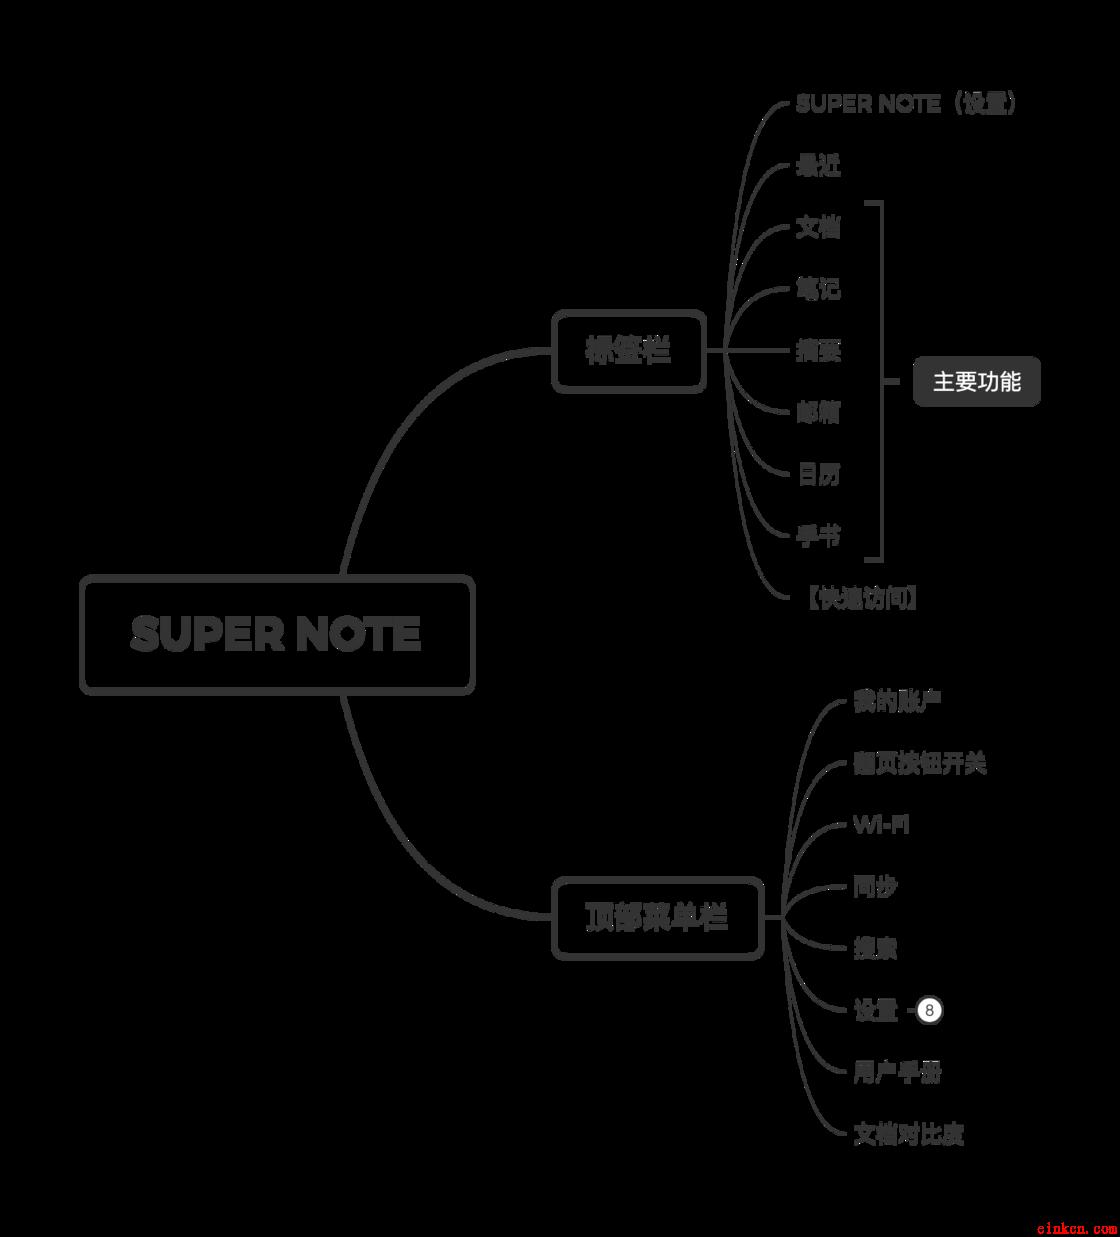 SUPER NOTE 软件逻辑